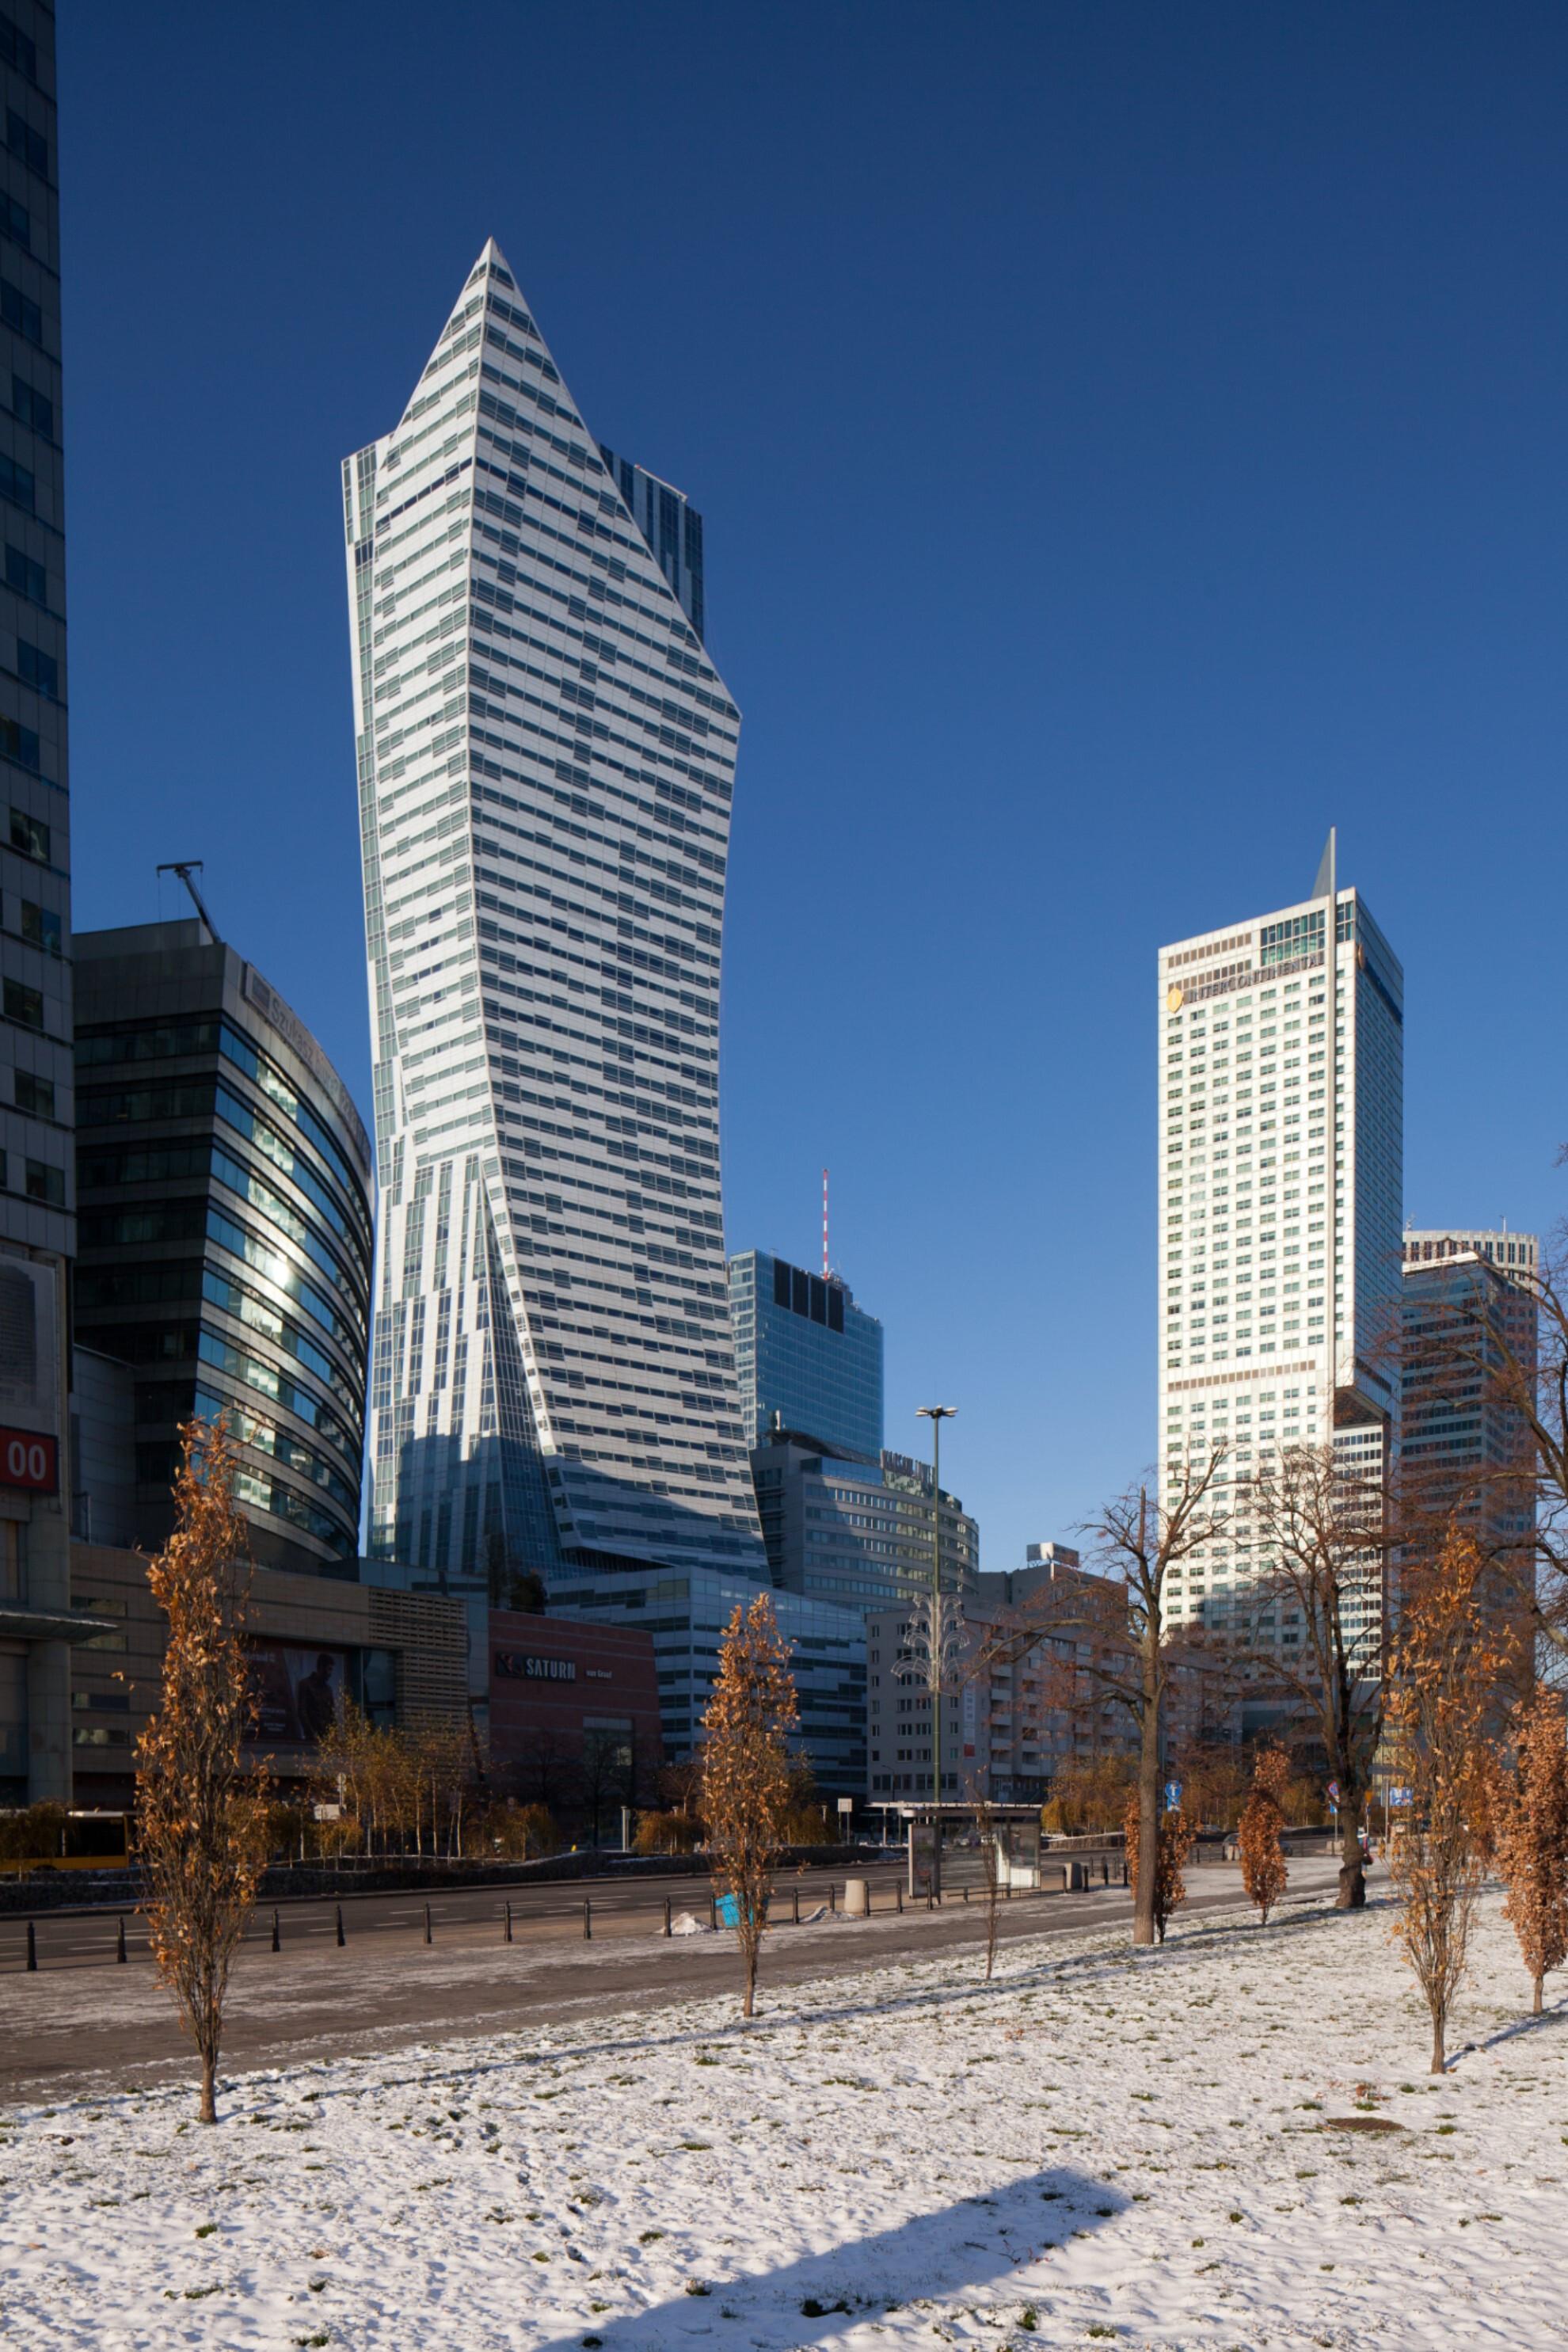 Zlota 44 Tower